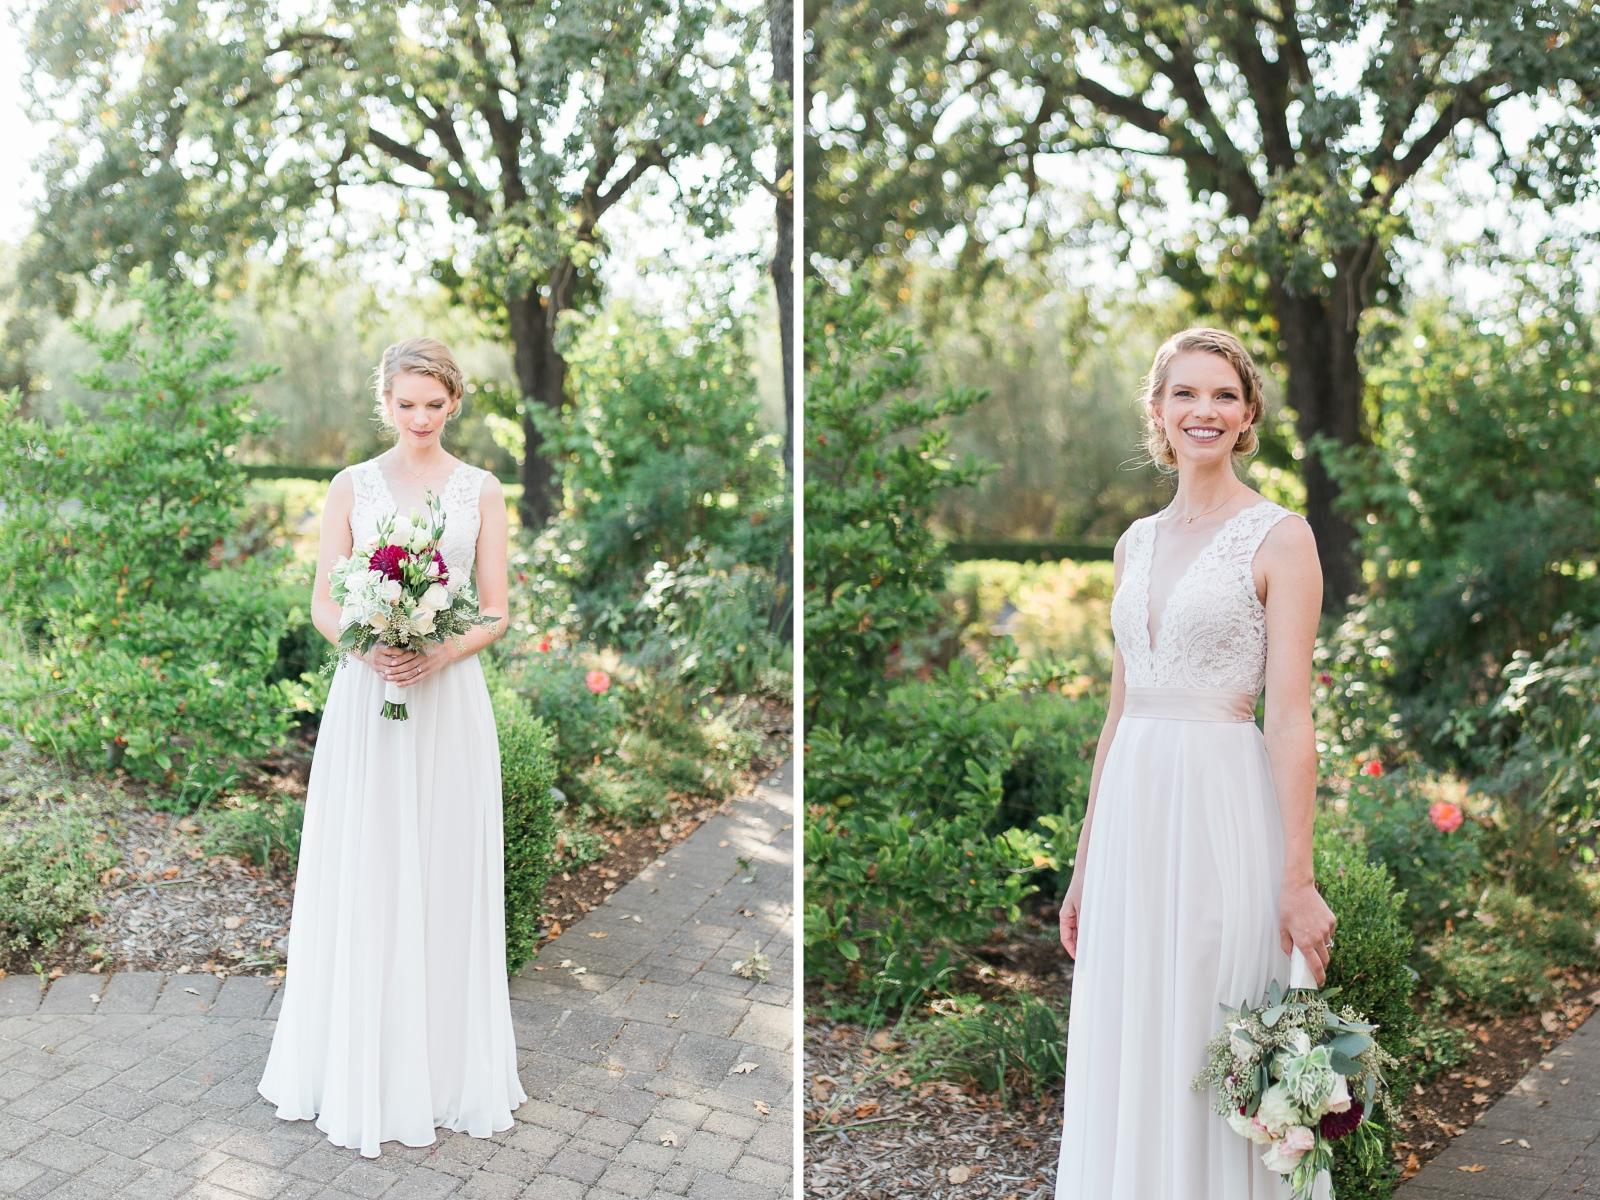 Generals Daughter Wedding Photos by JBJ Pictures - Ramekins Wedding Venue Photographer in Sonoma, Napa (16).jpg